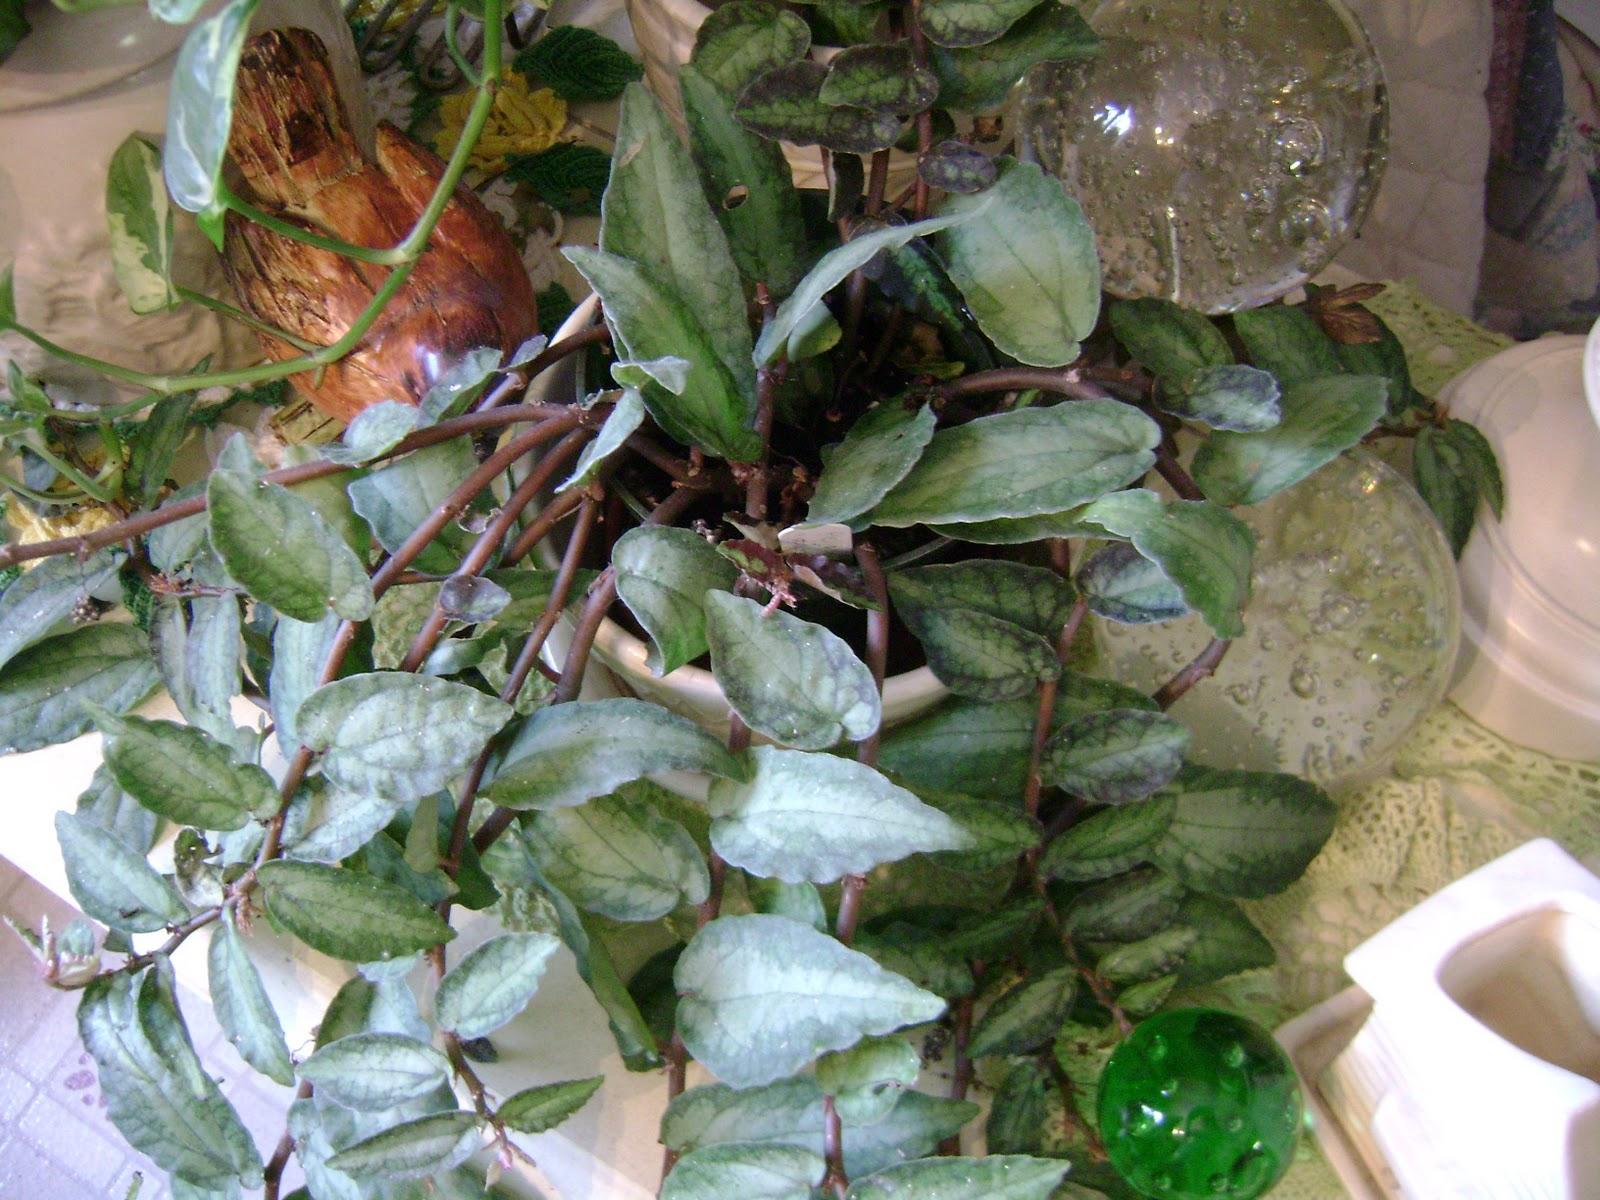 Houseplant Guru: Pets and Our Plants